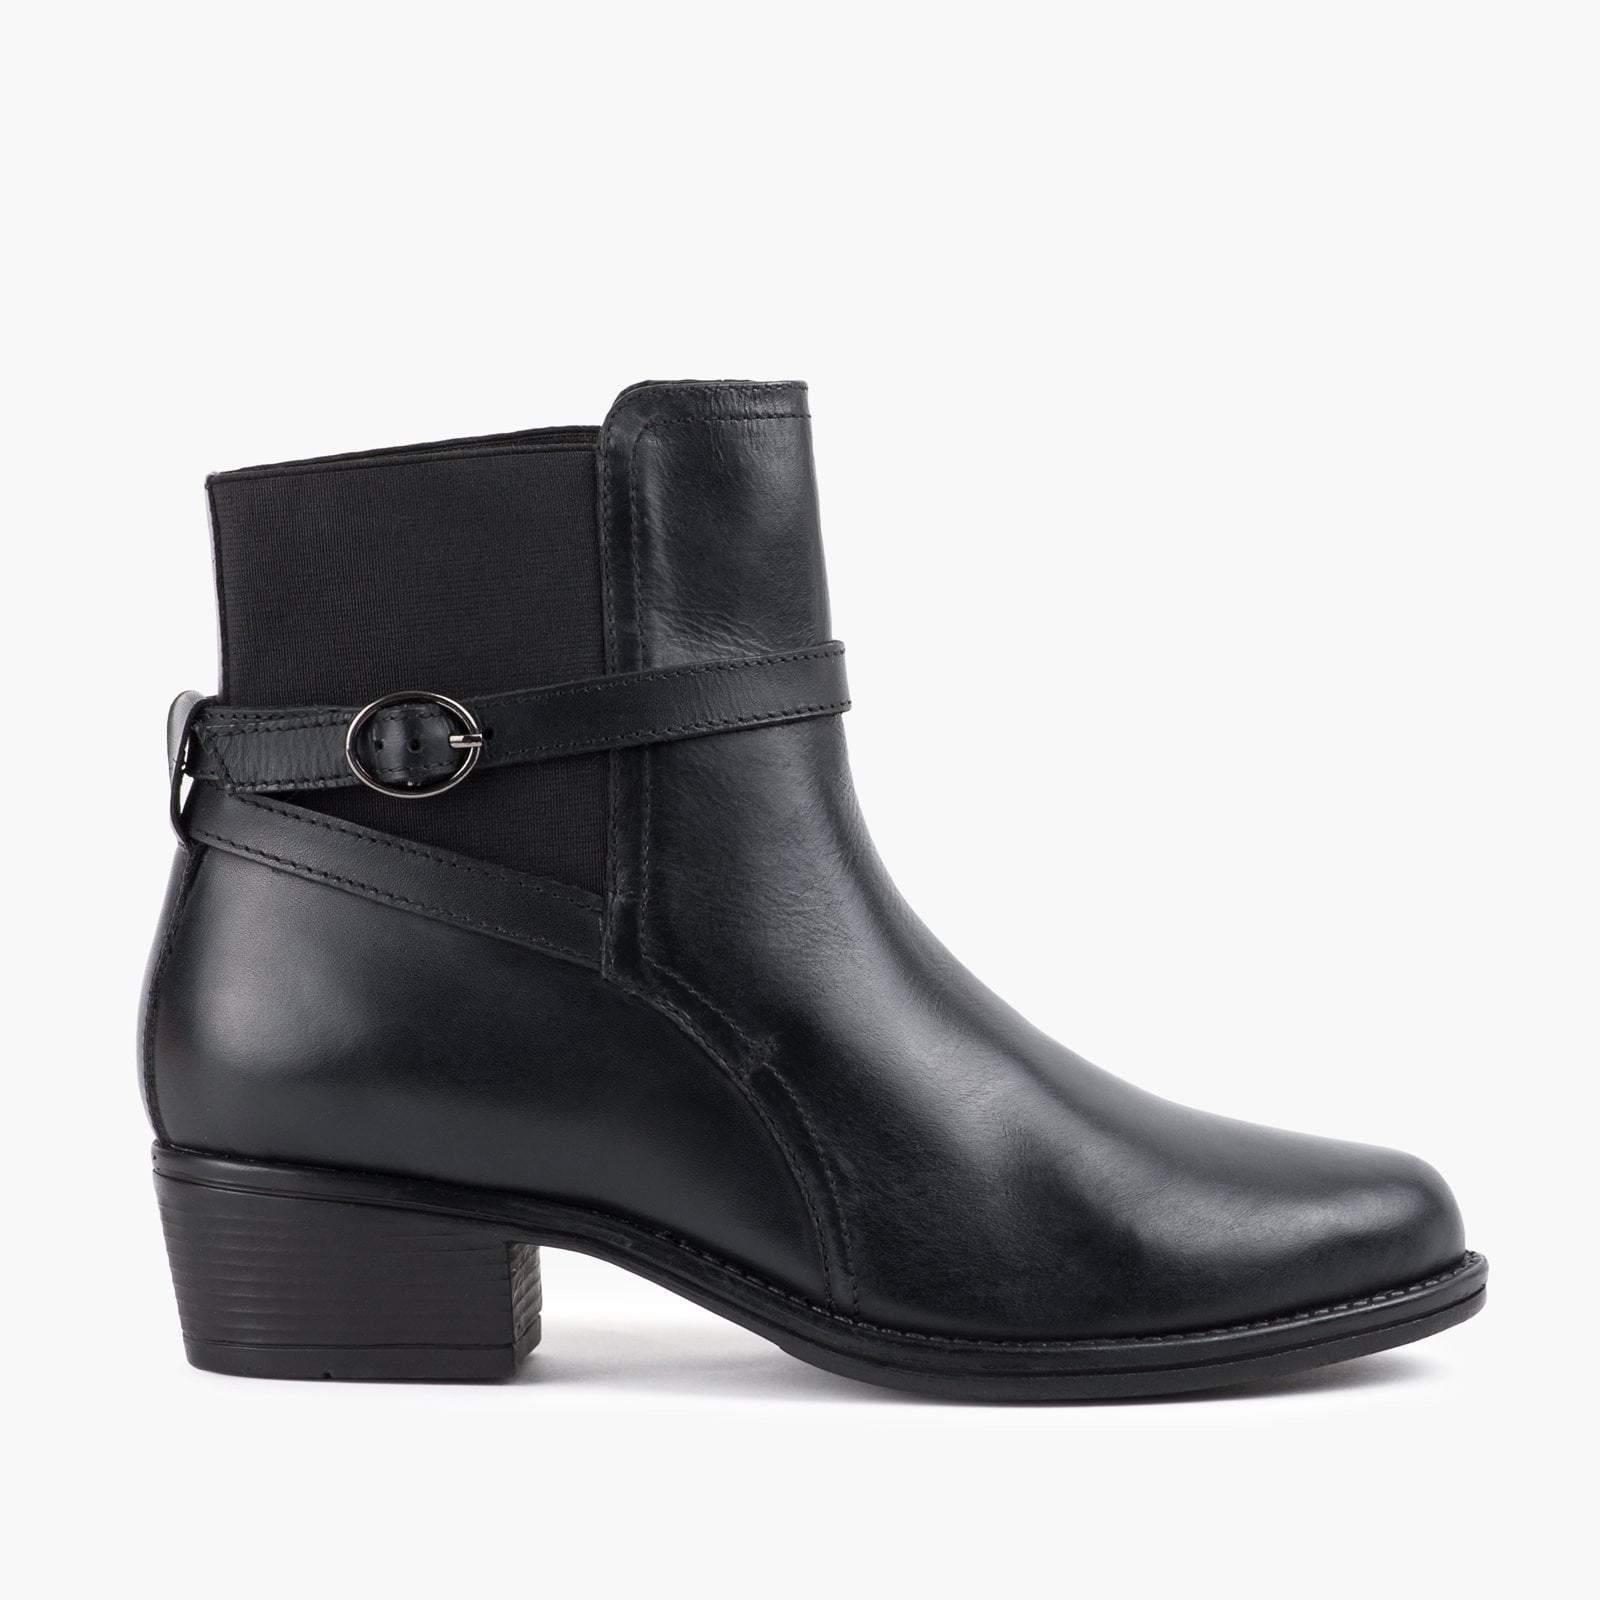 Ladies Black Strap Ankle Boot | Upp till 70% |